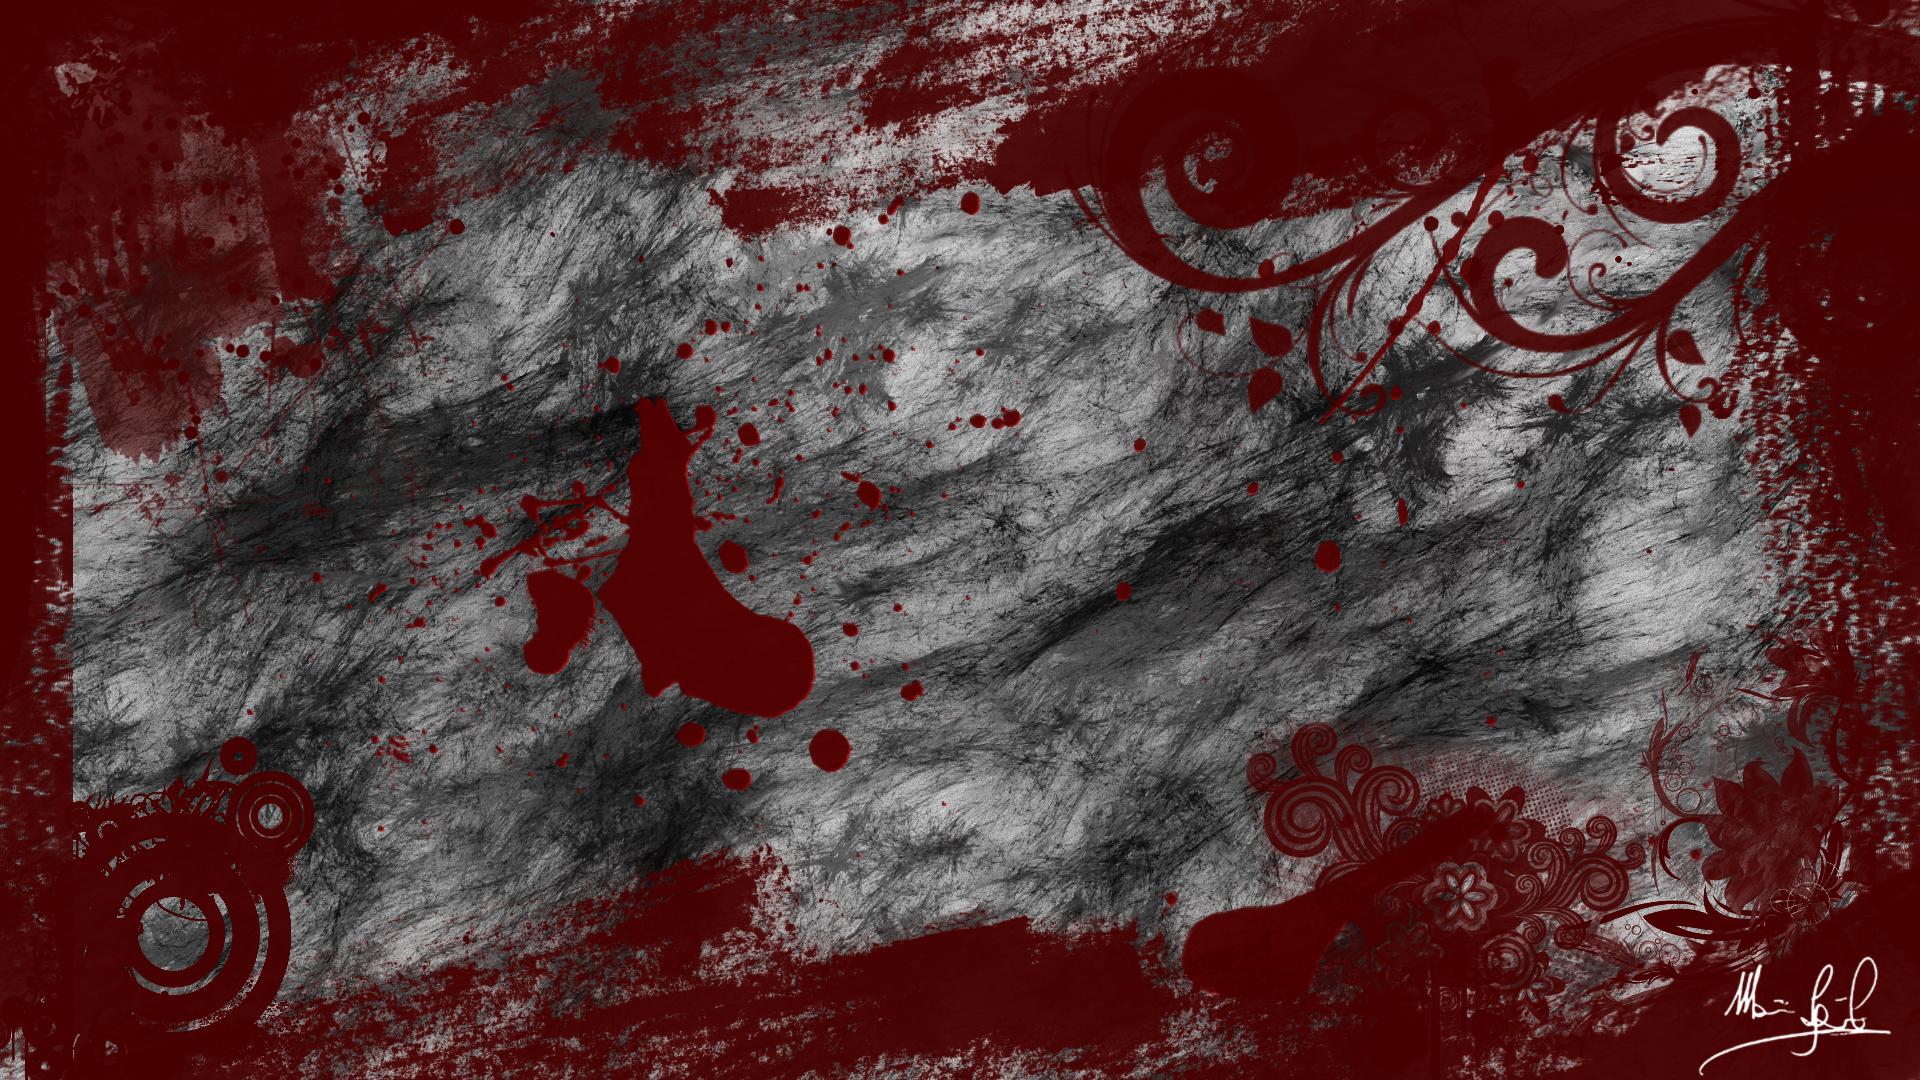 Blood Wallpaper By TheArtOfDarkness On DeviantArt